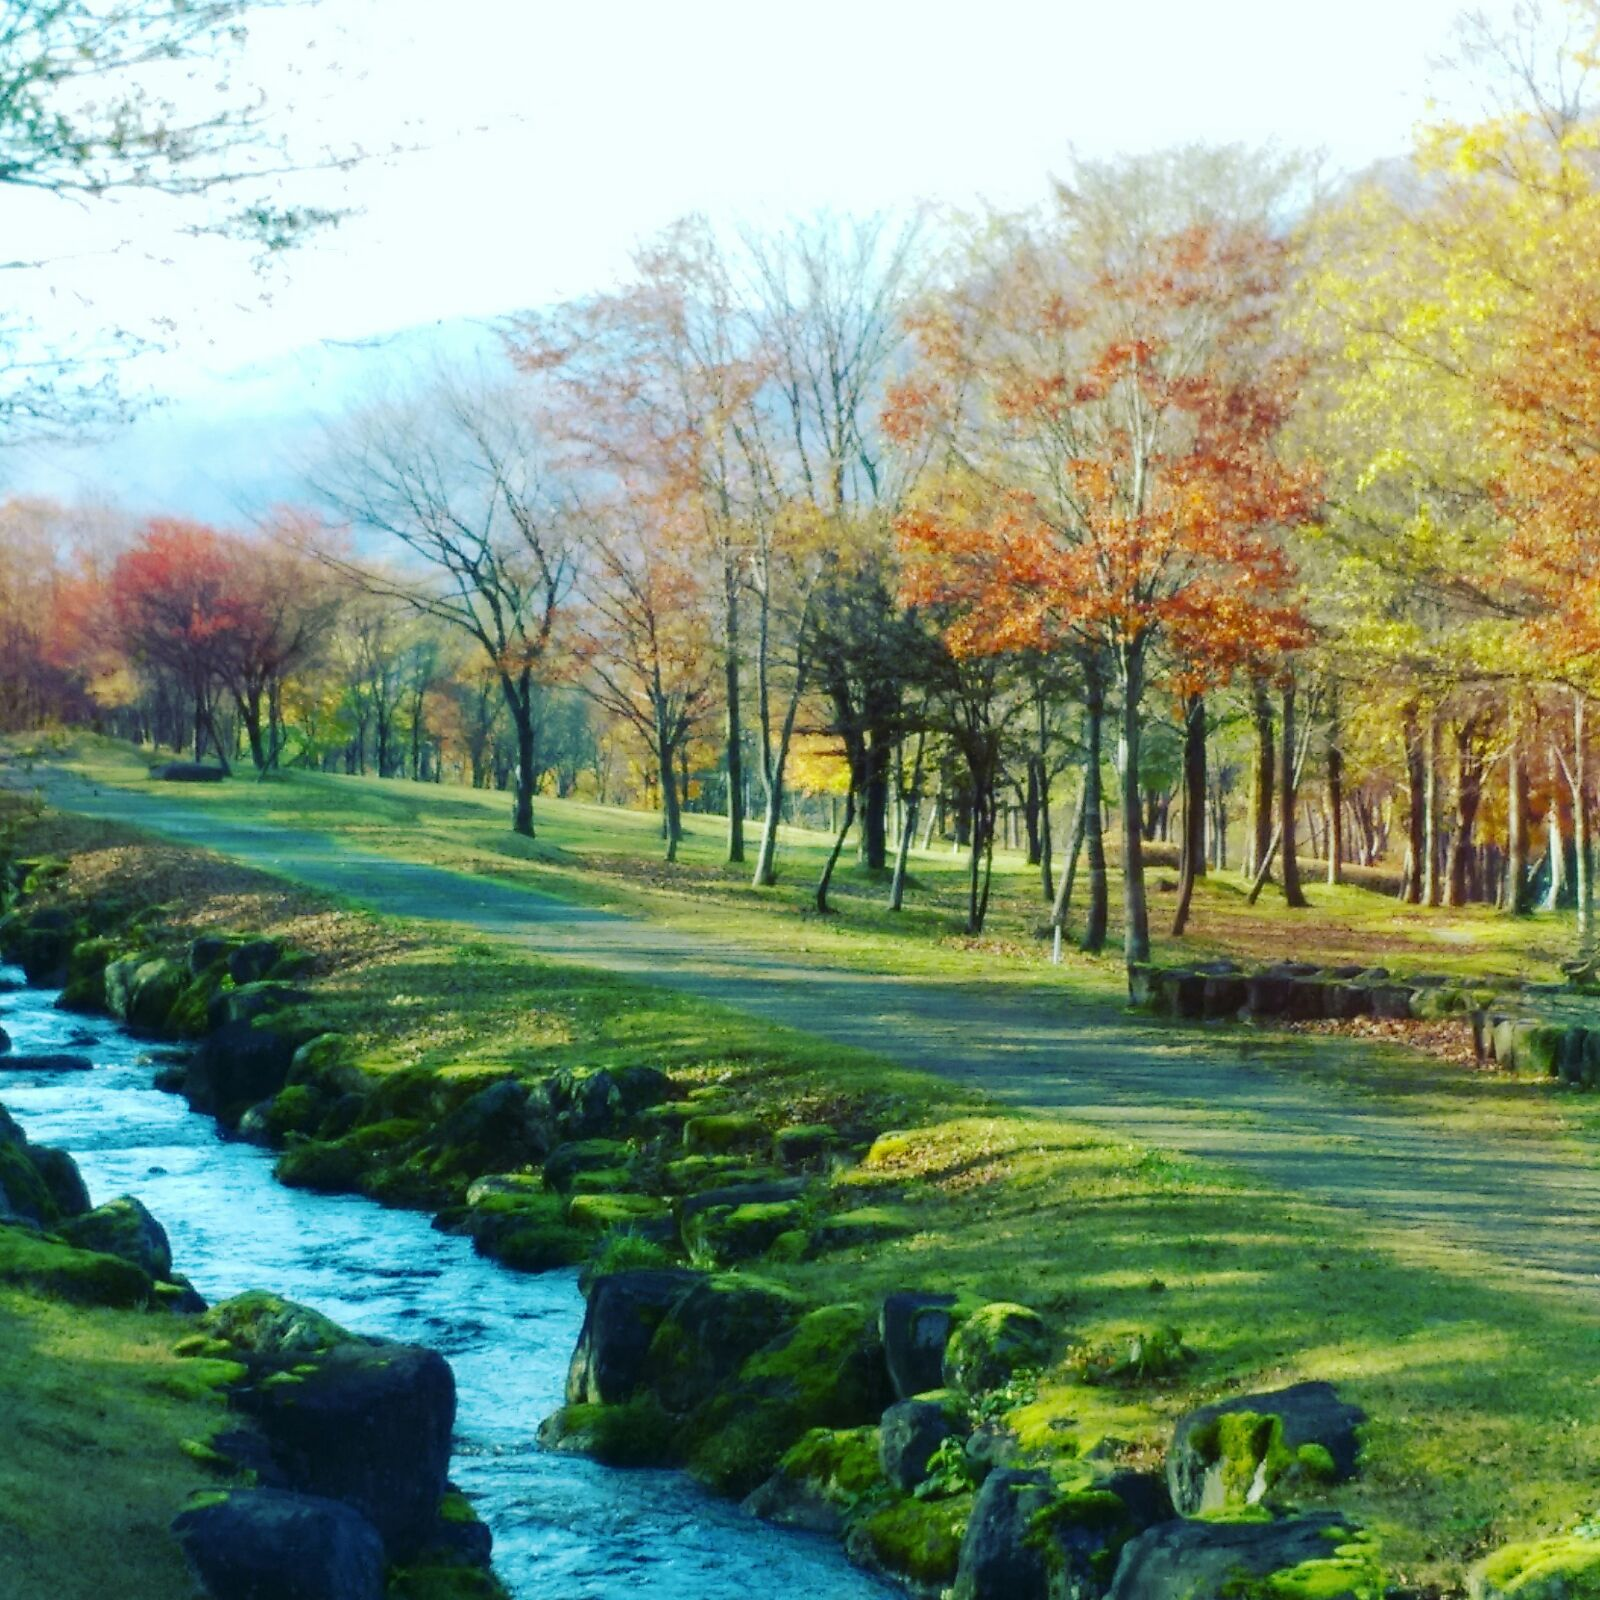 Autumn leaves in Yamagata